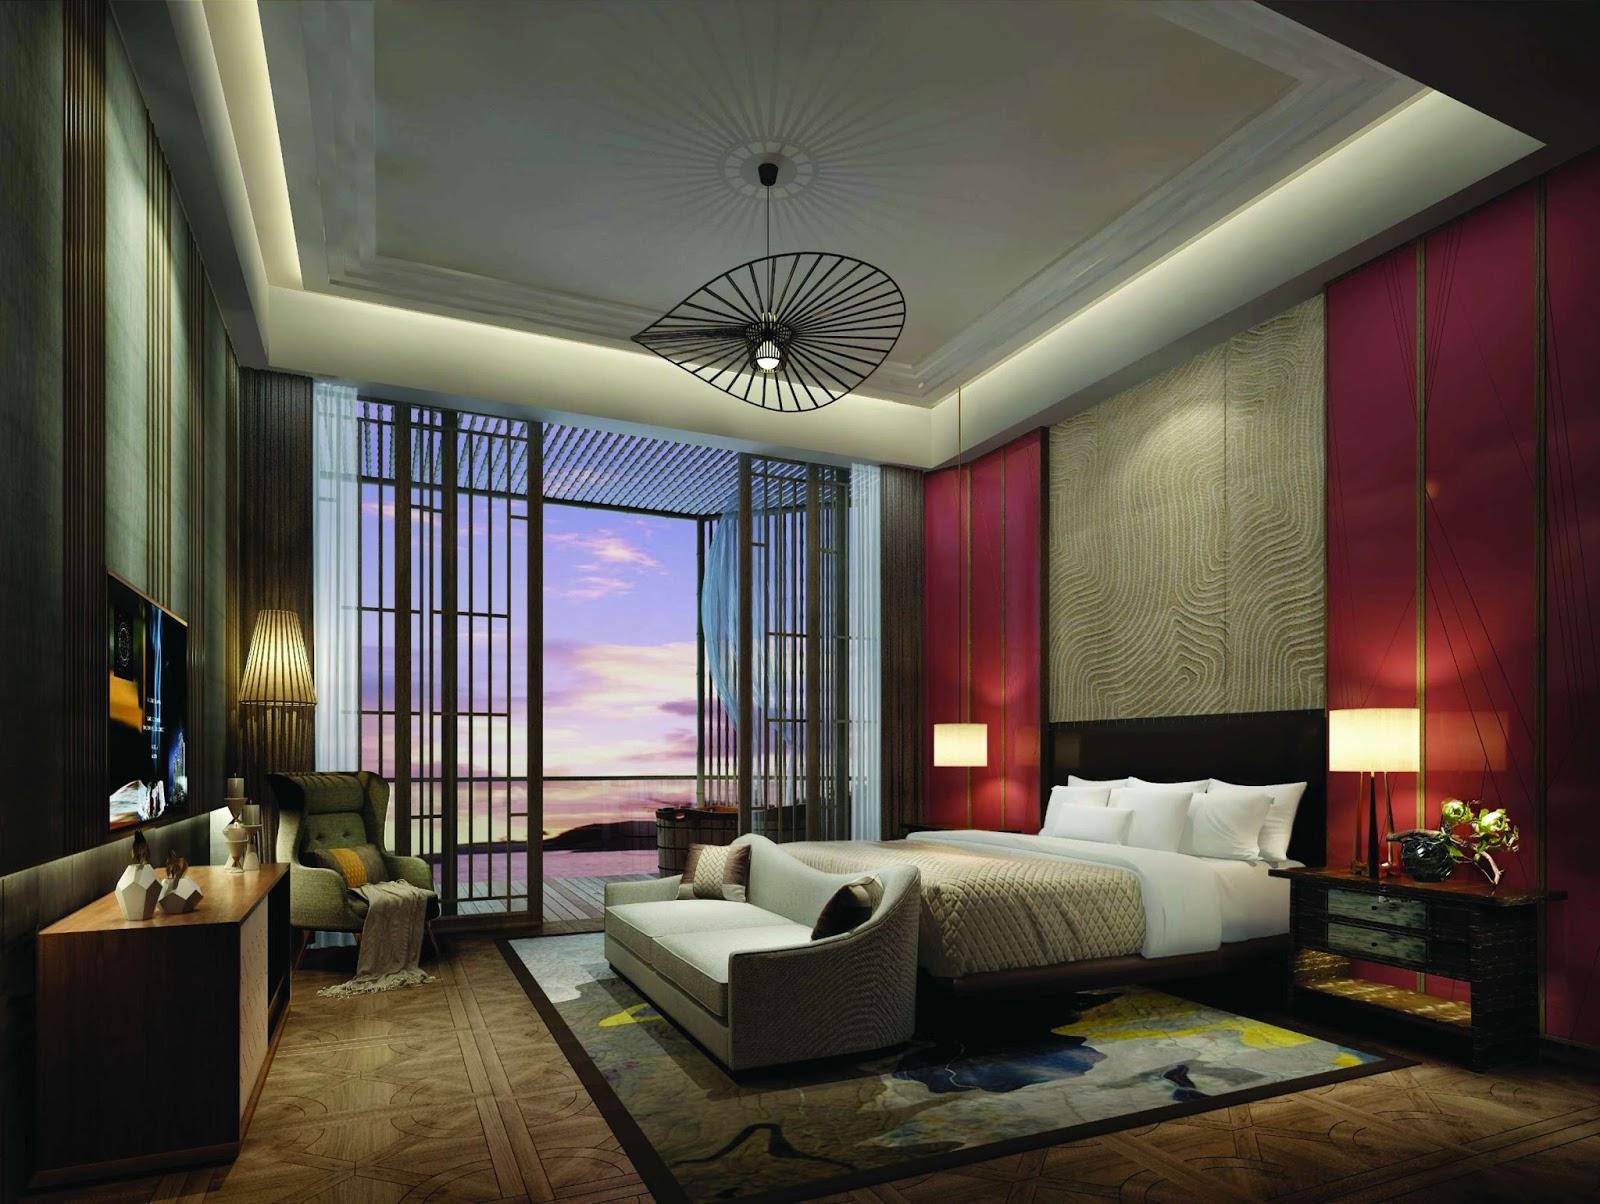 Thiết kế căn hộ La Luna Resort Nha Trang